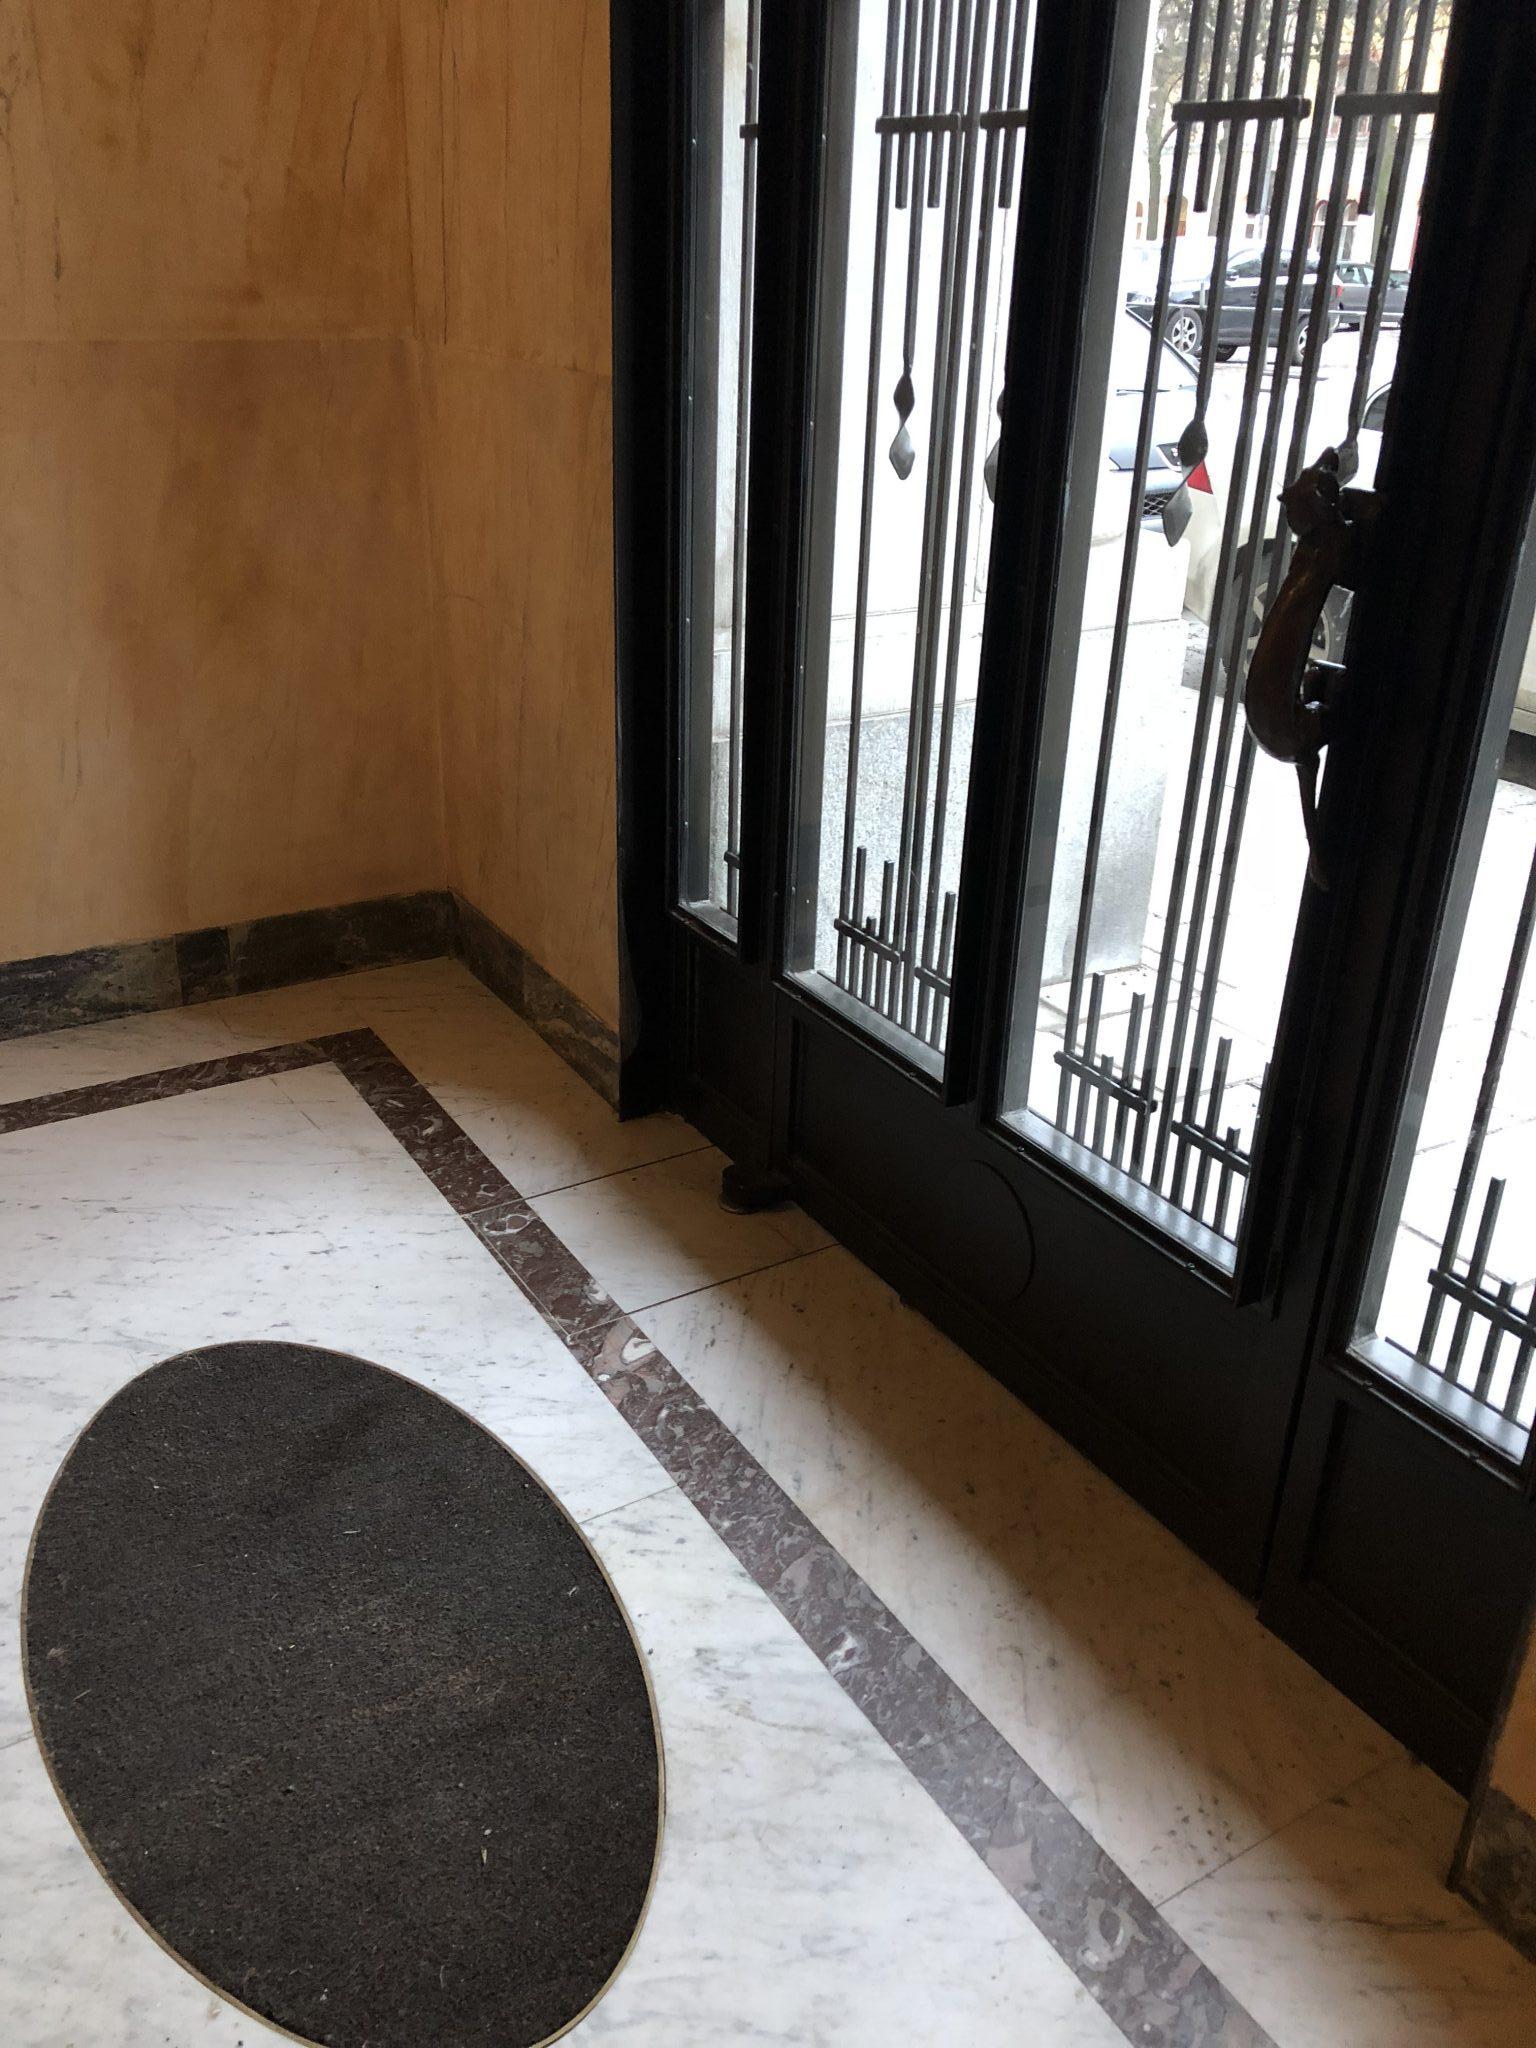 Noggrann renovering av trapphus i Stockholm, av Rex Arkitektbyrå